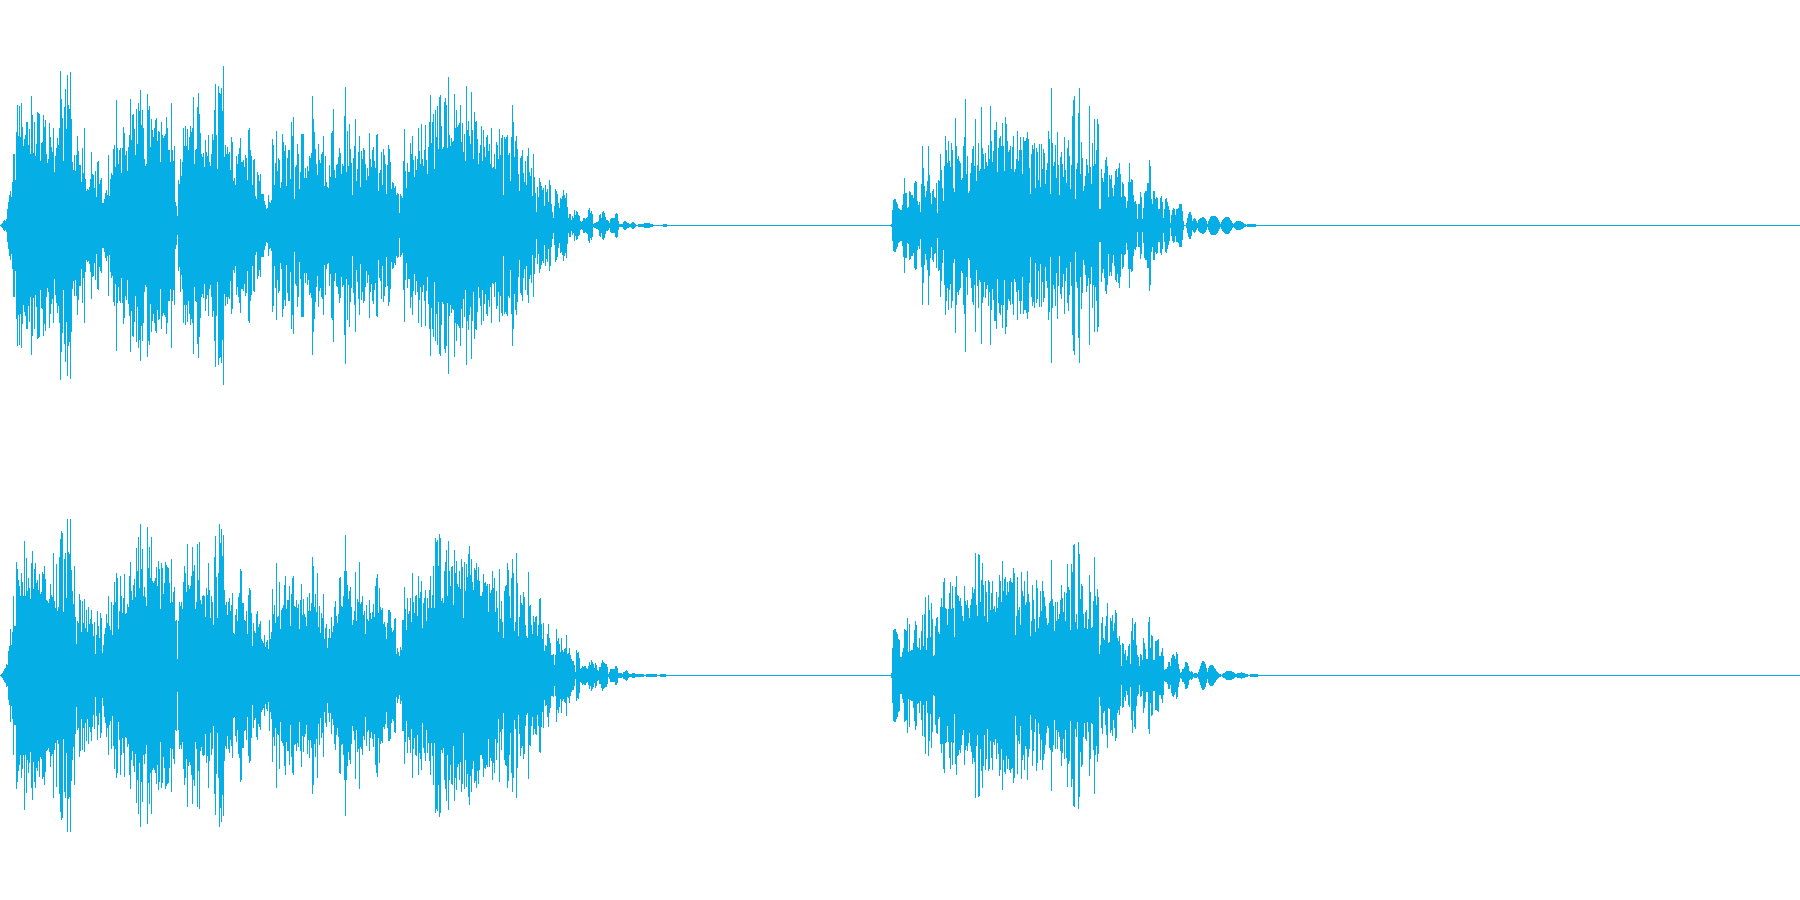 DJスクラッチ05_リバース音05の再生済みの波形